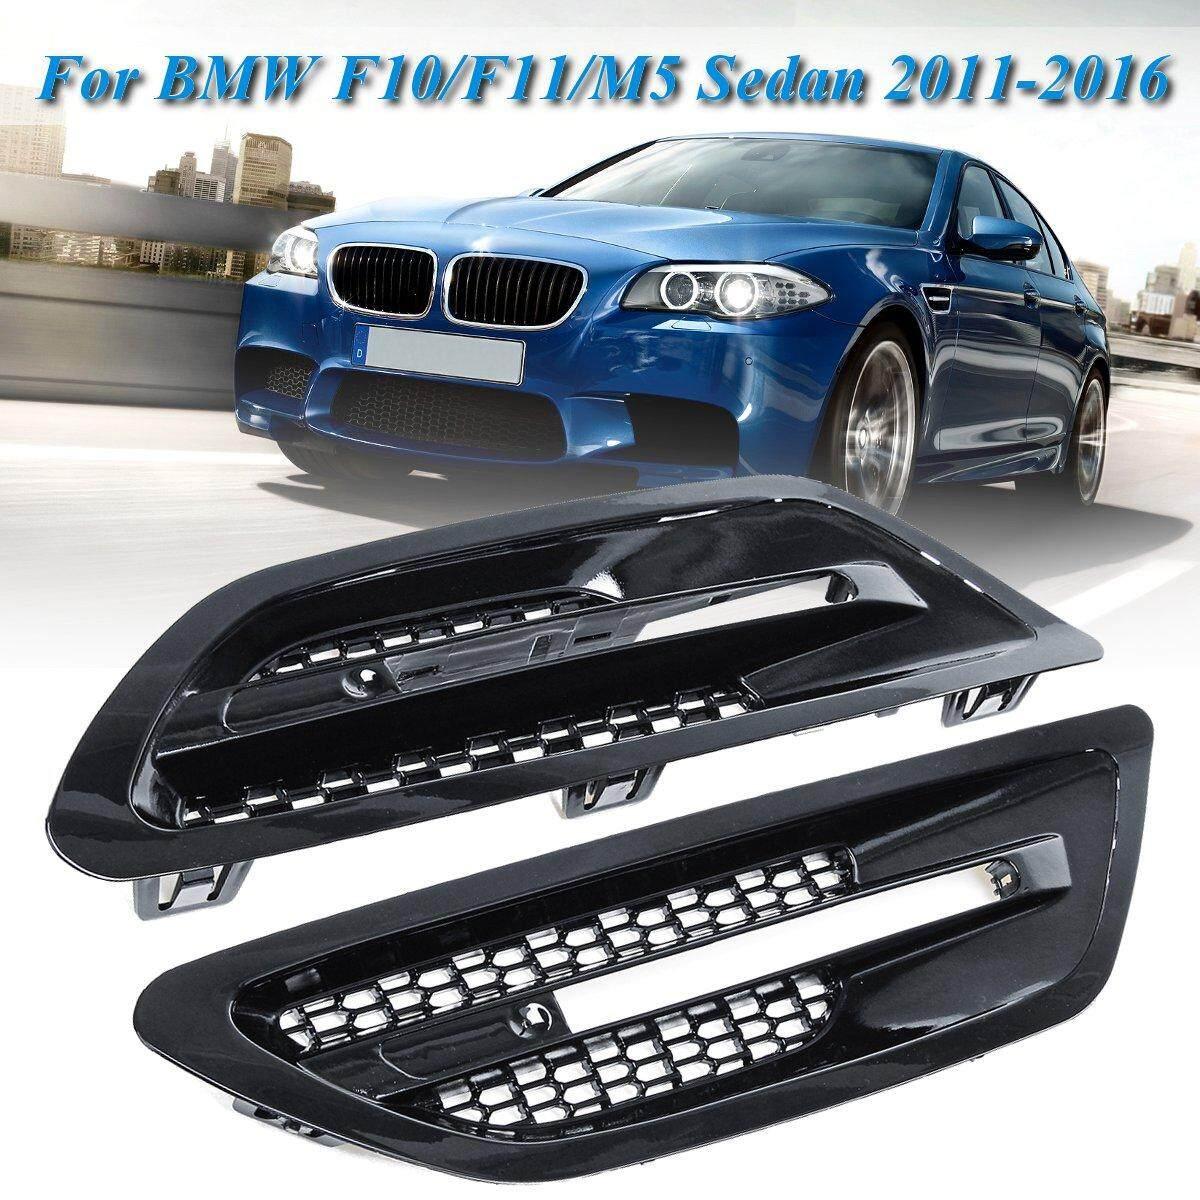 【Free Shipping + Flash Deal】Pair Car Side Air Flow Vent Fender Grilles For  BMW F10/F11/M5 Sedan 2011-2016